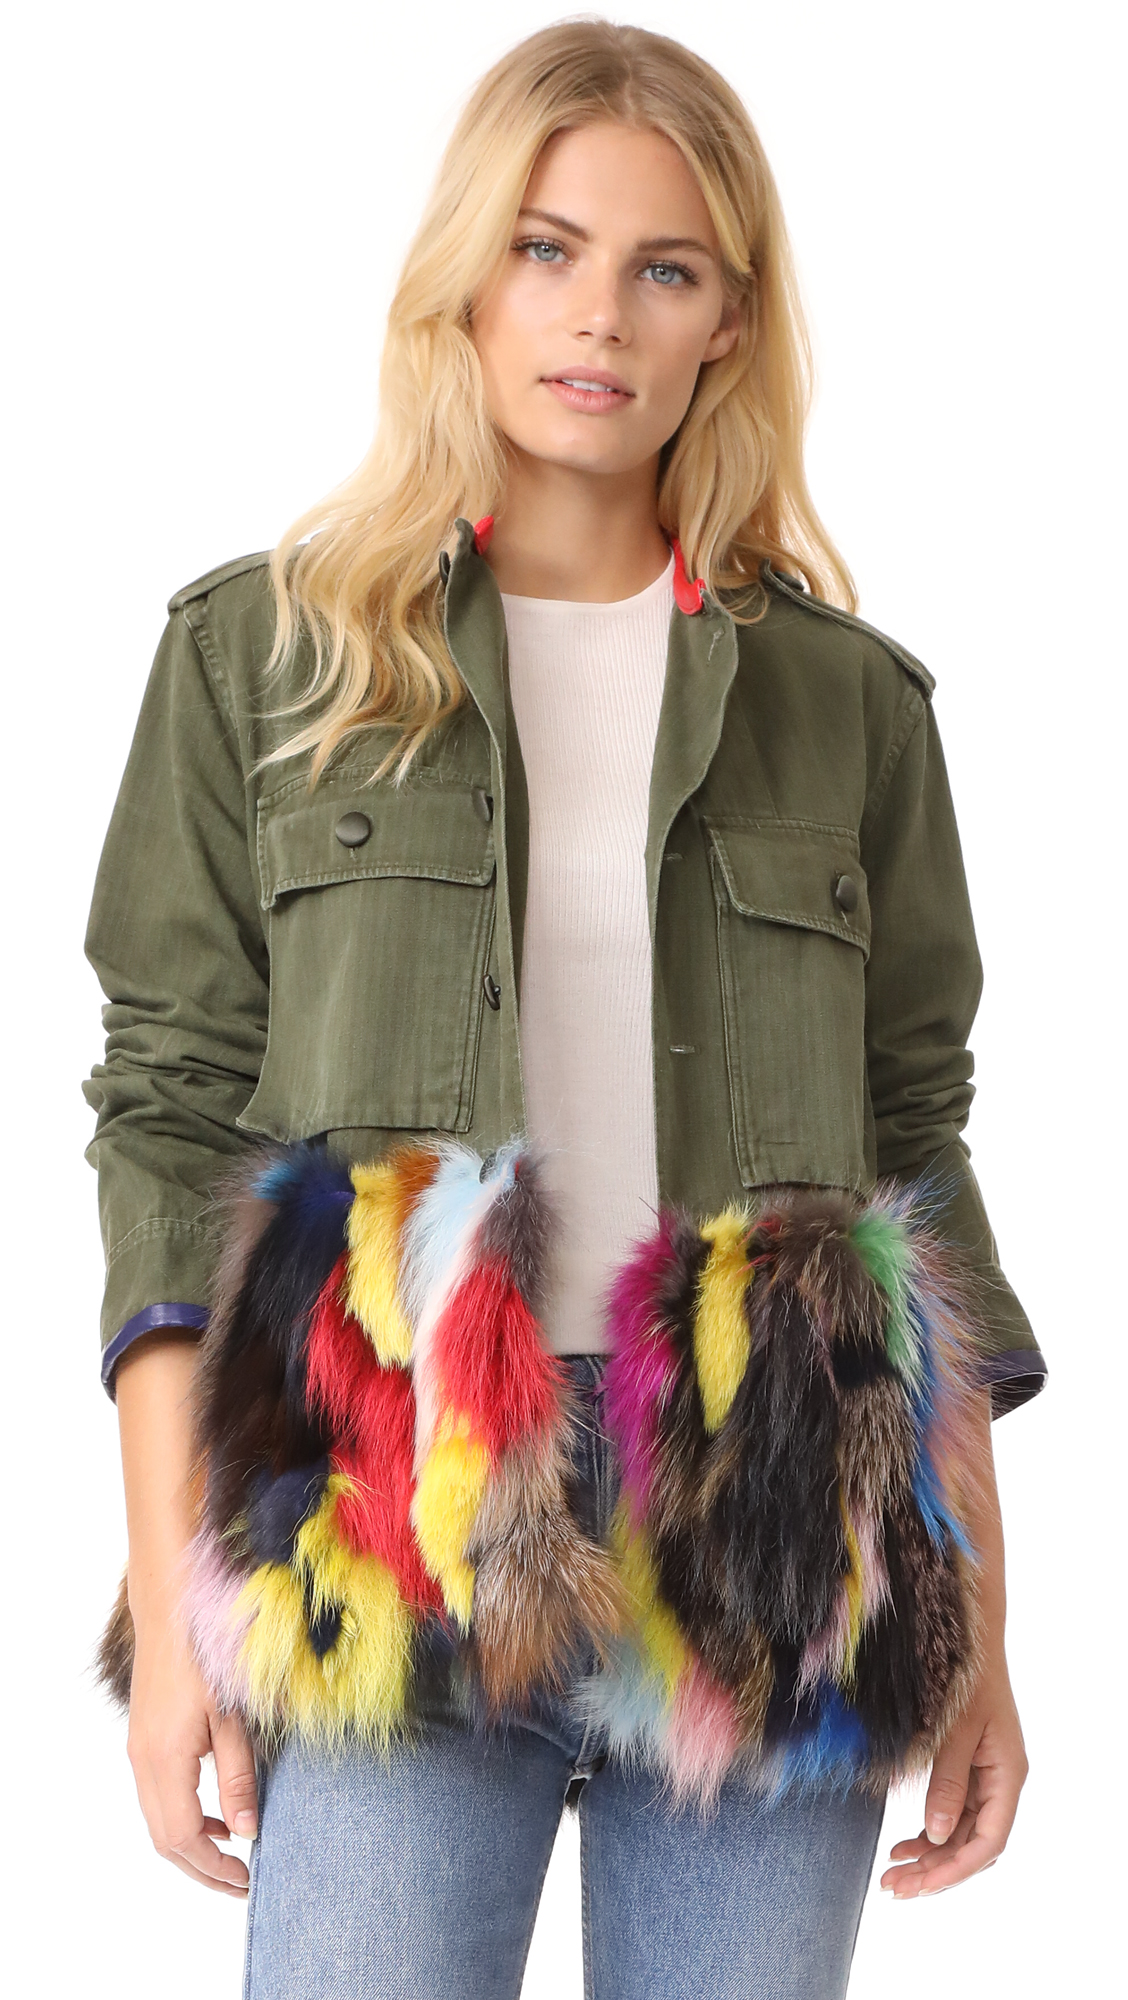 Harvey Faircloth Field Jacket with Fur Trim - Olive